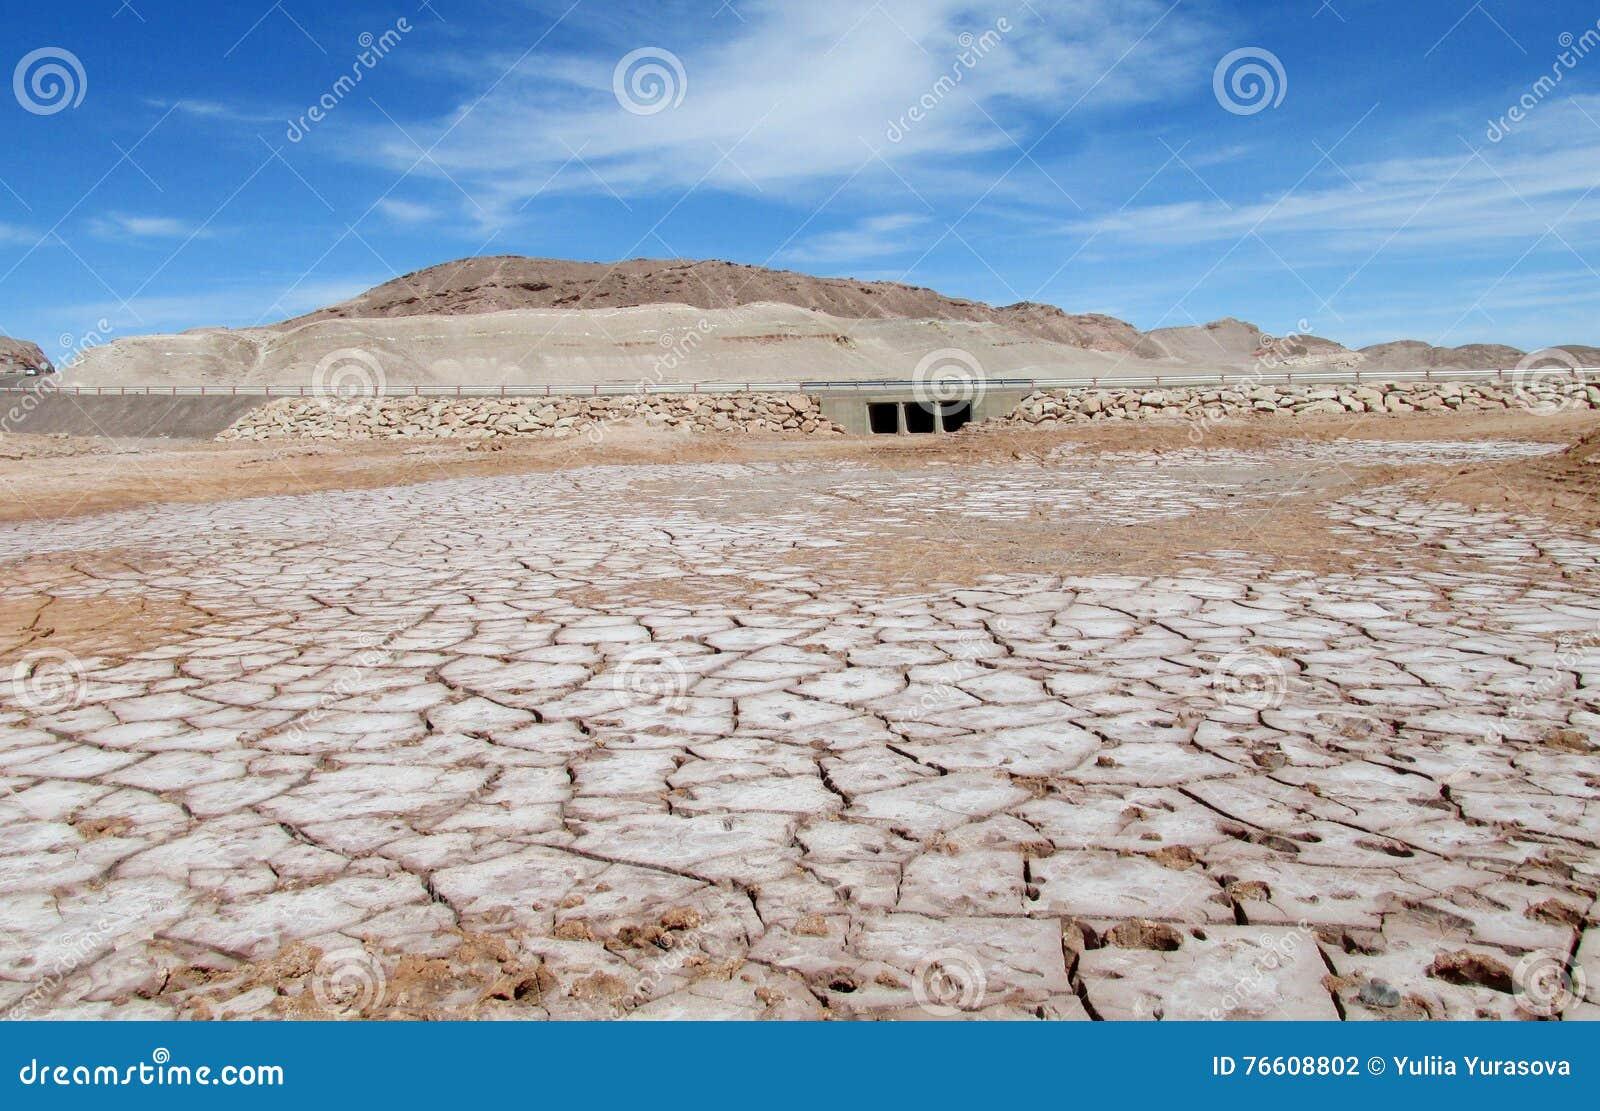 Suchy słony ziemia wzór w San Pedro de Atacama pustyni